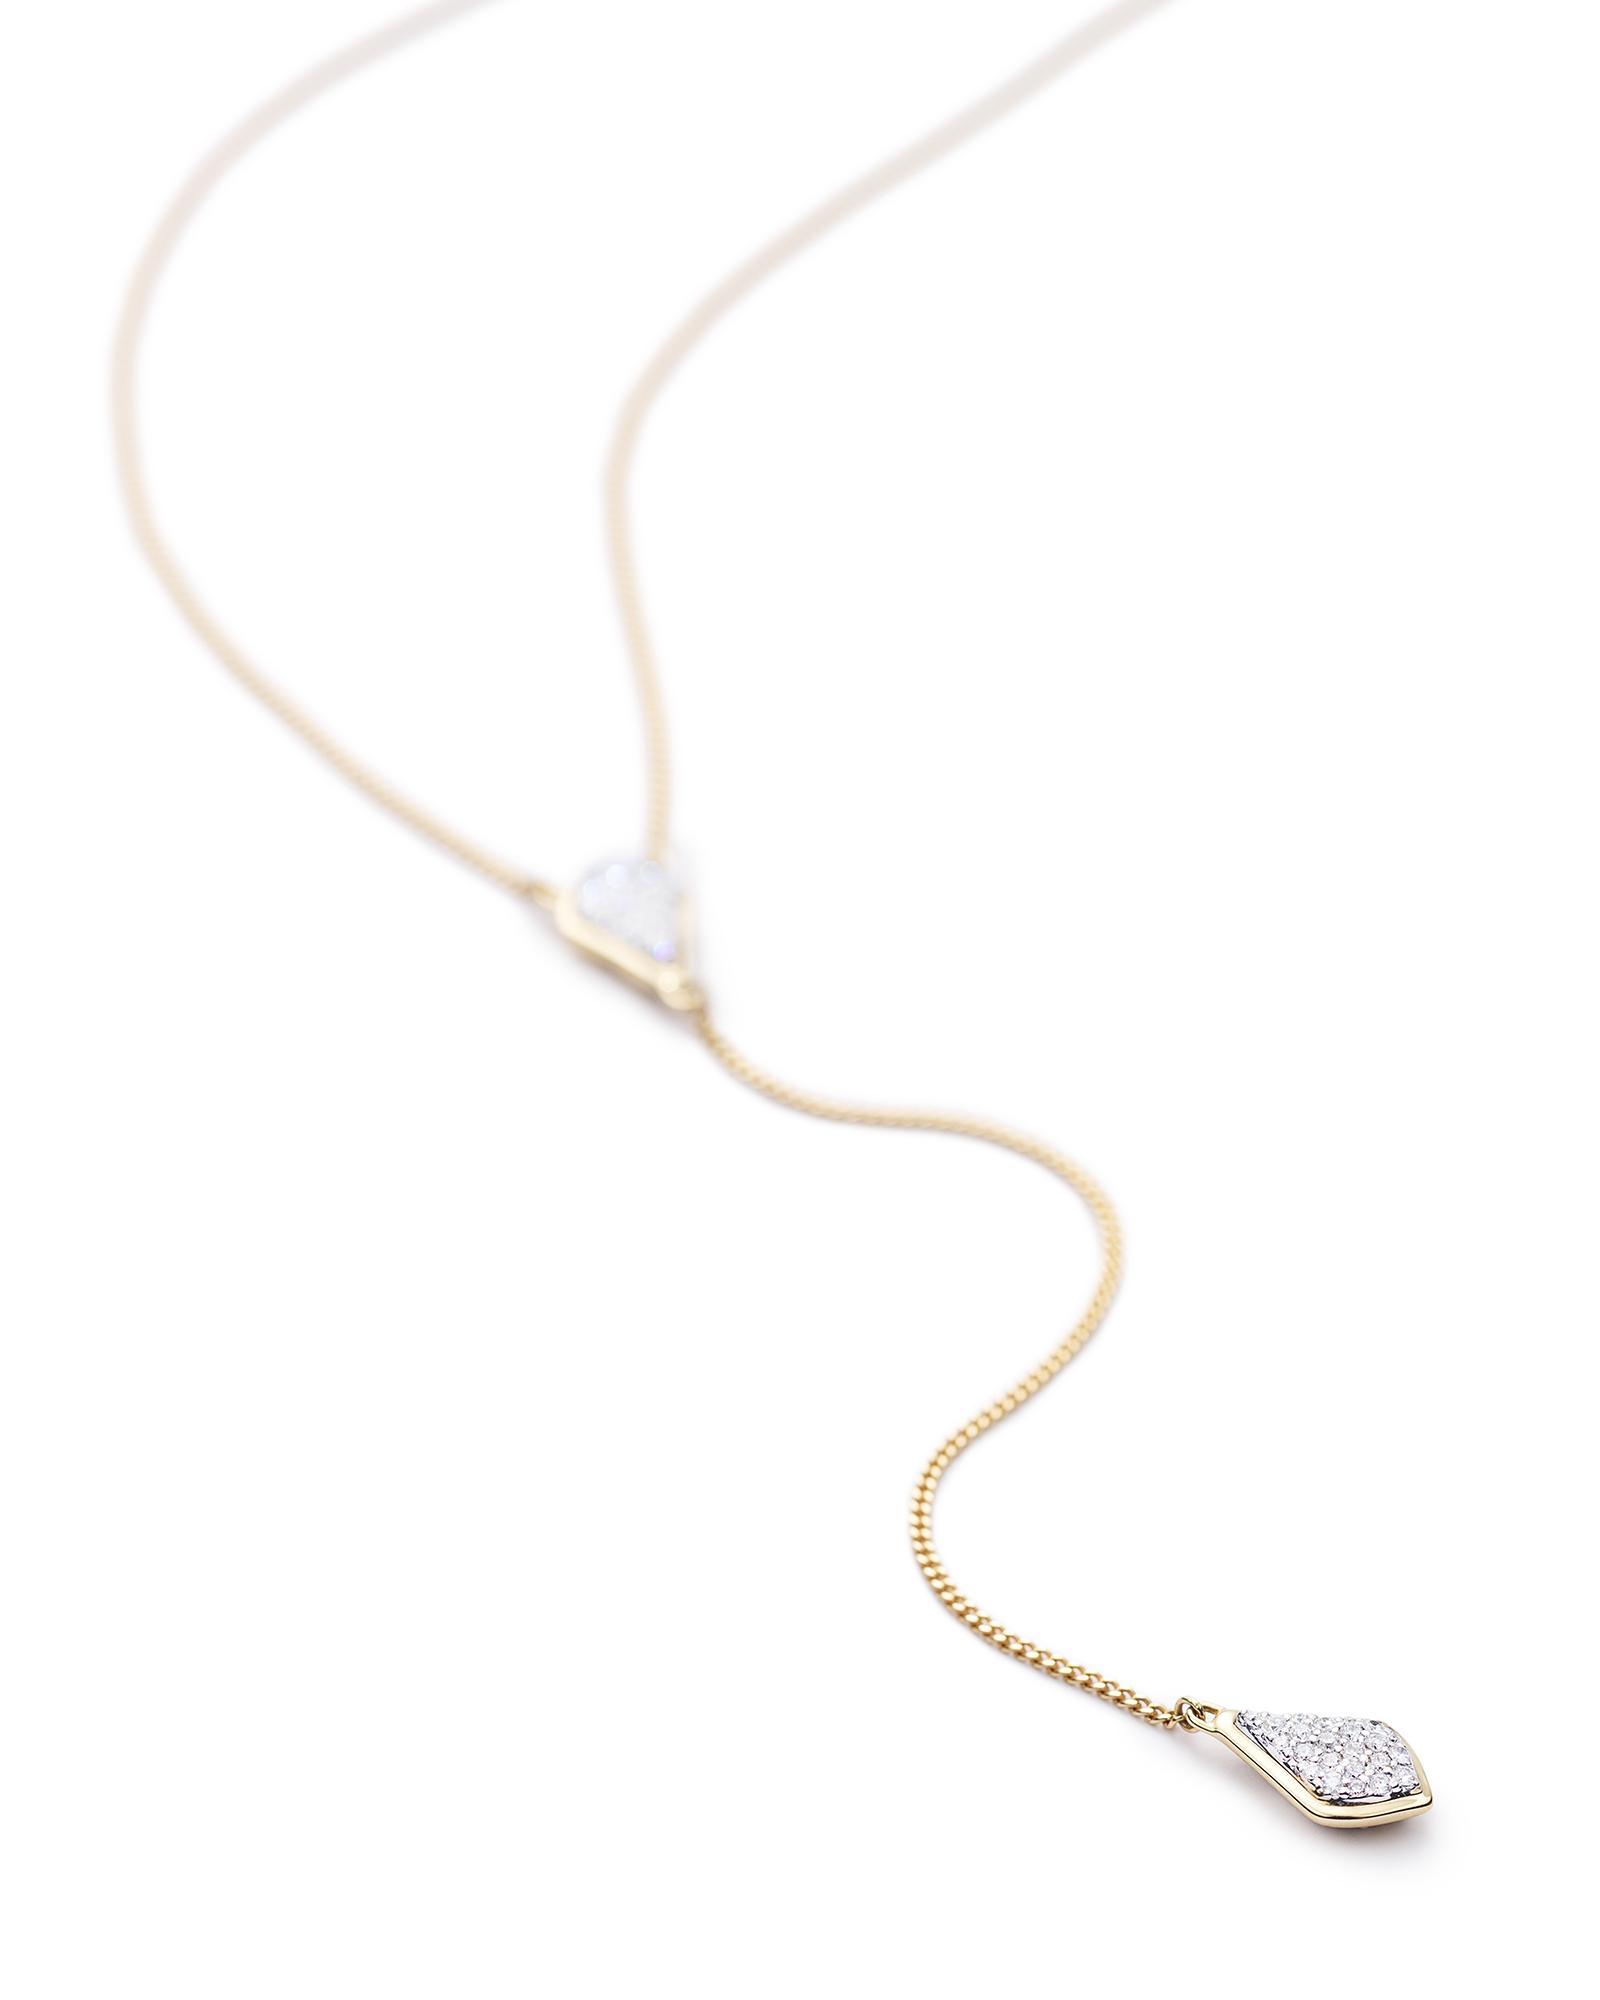 Lillian Diamond Y Necklace in 14k Gold